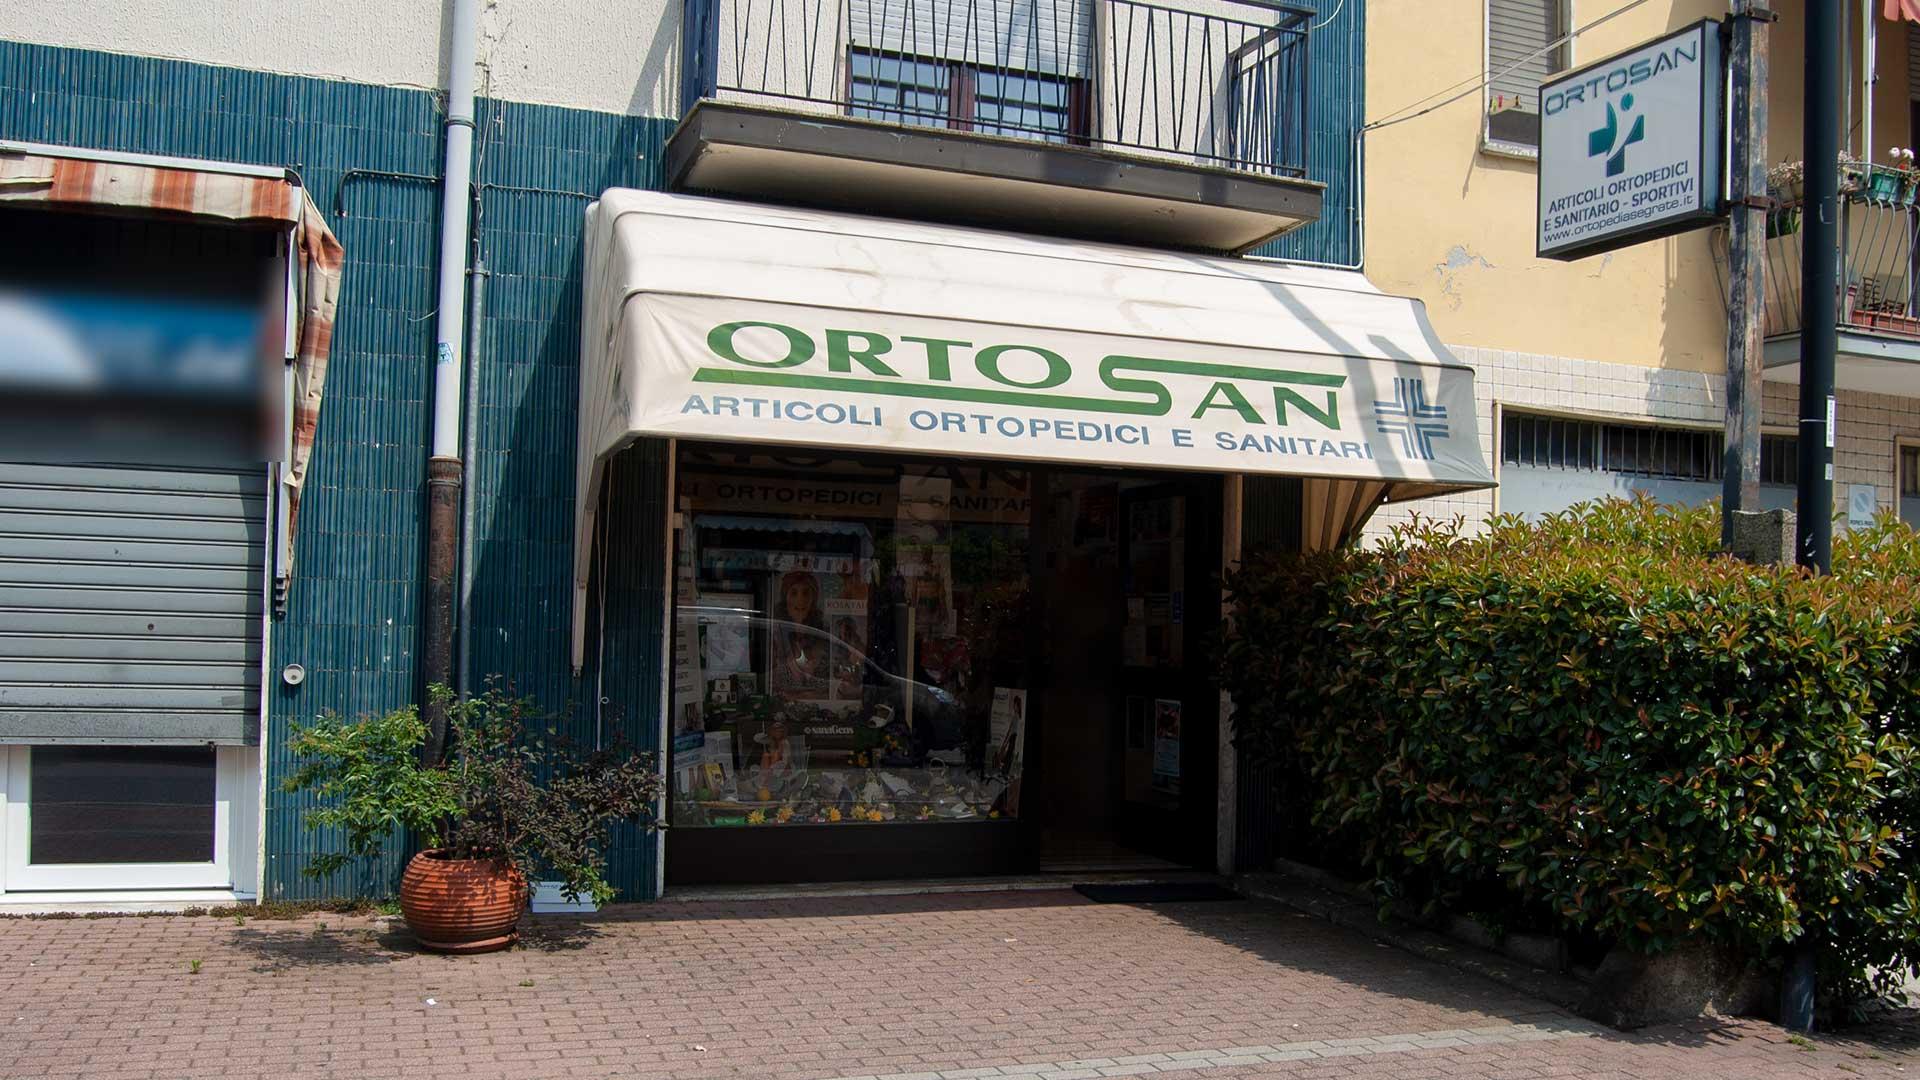 Ortopedia Ortosan Segrate